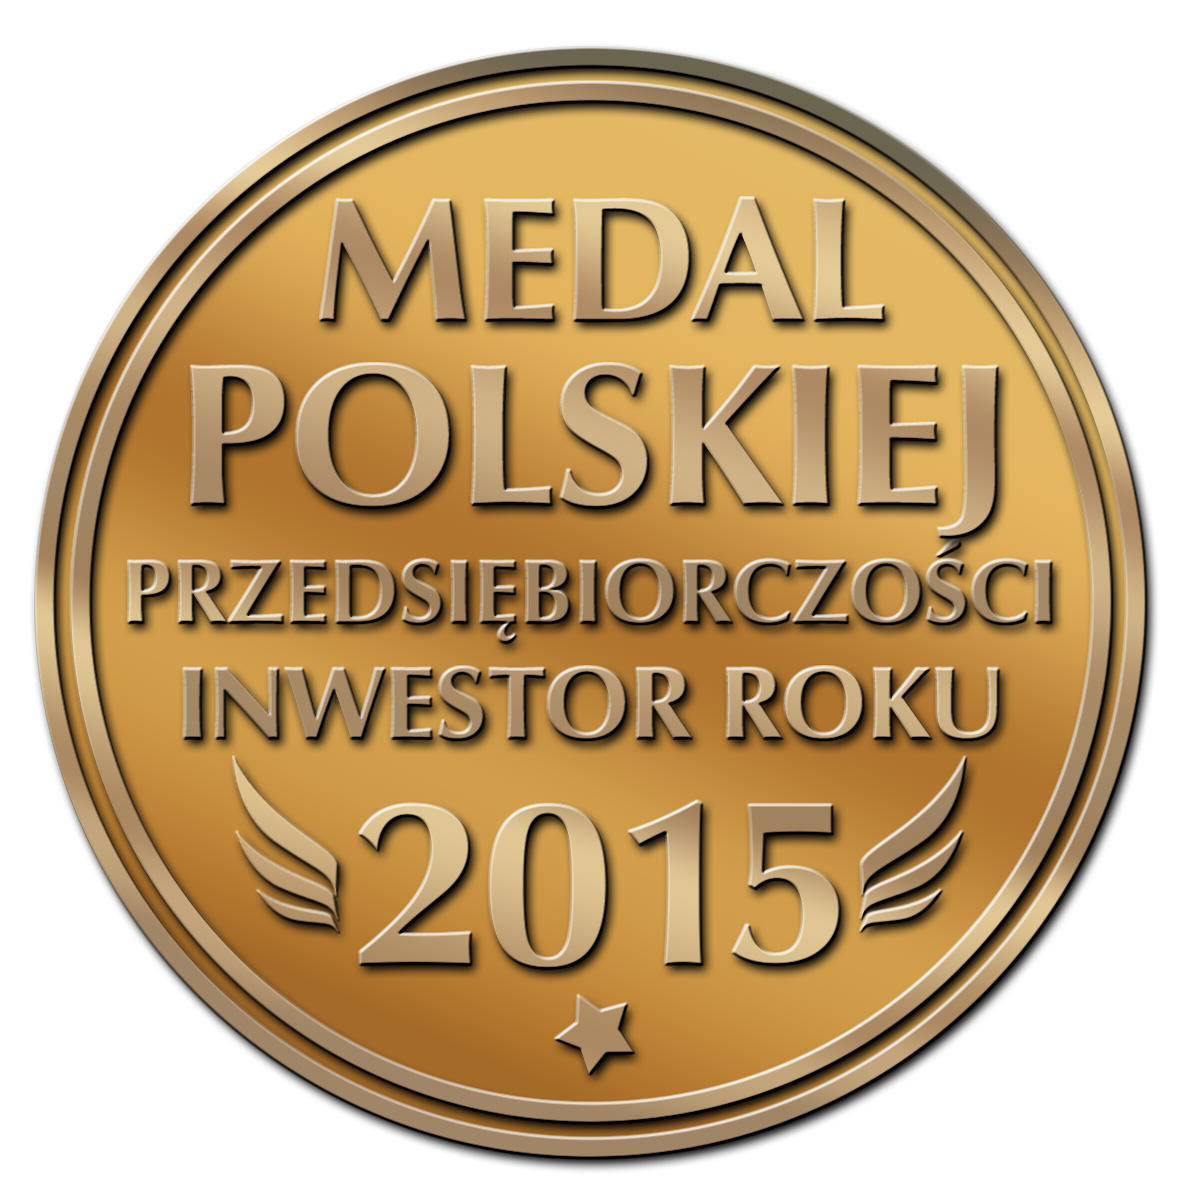 INWESTOR Roku 2015